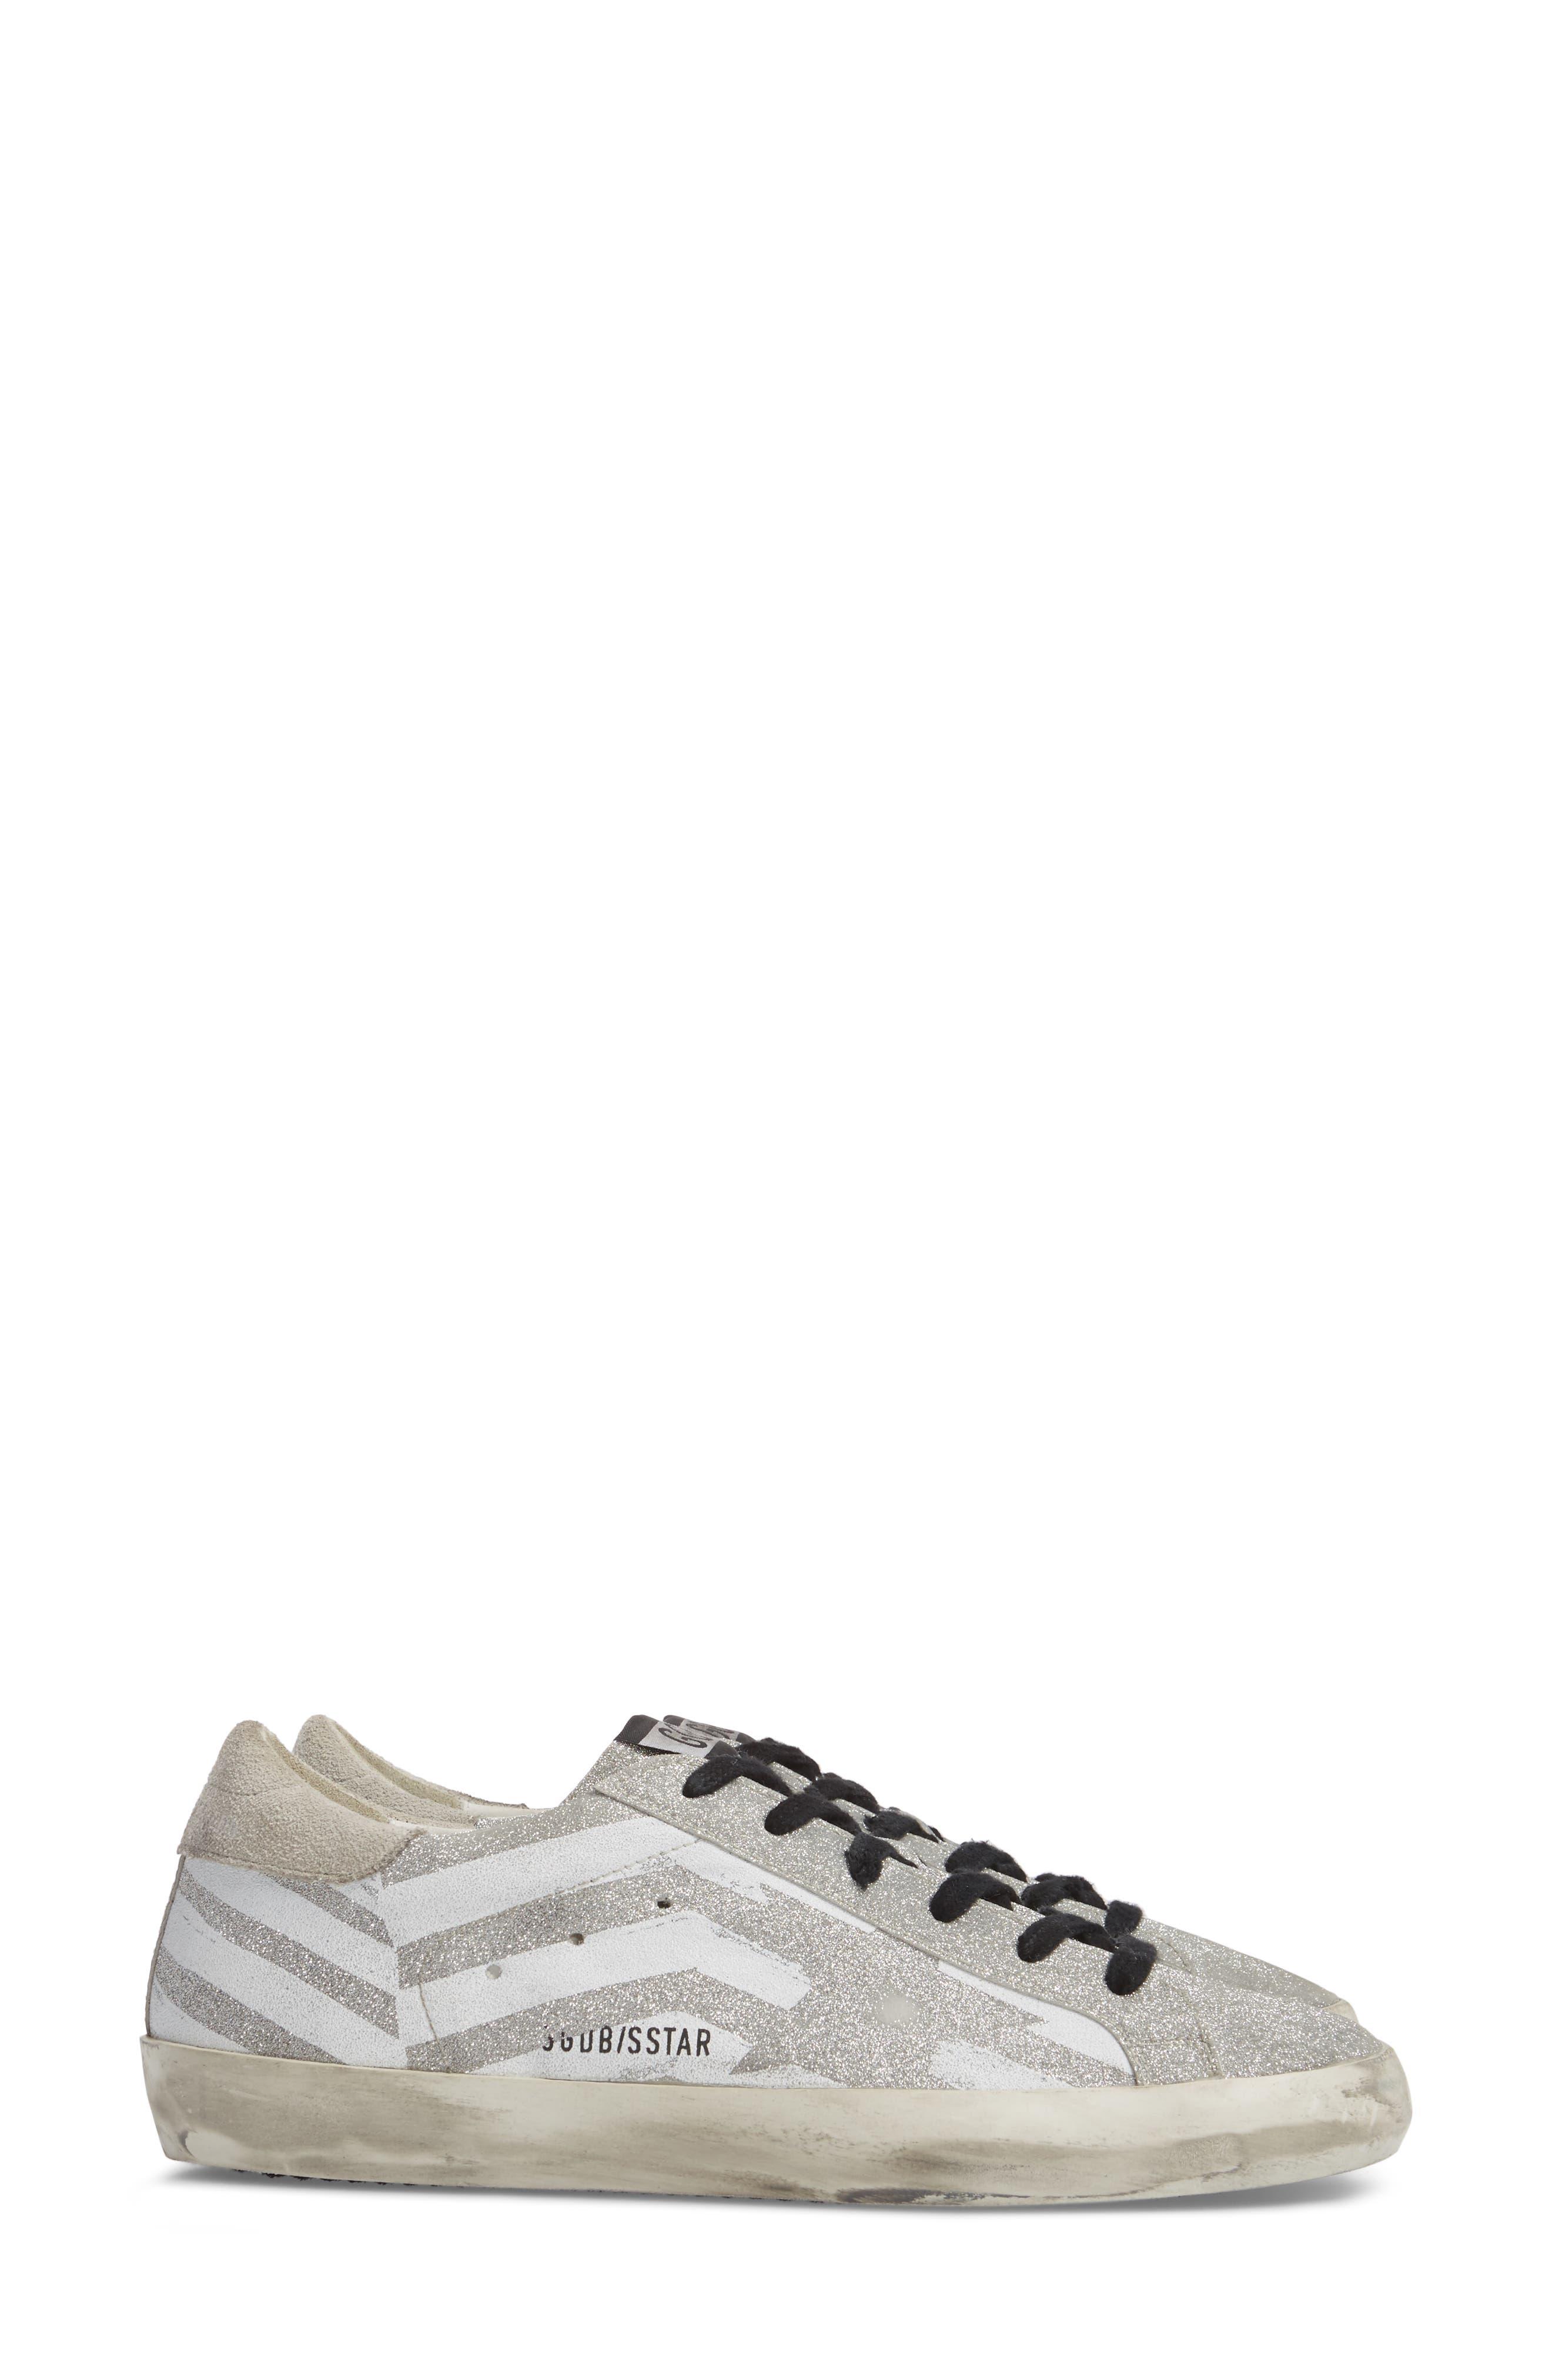 Superstar Low Top Sneaker,                             Alternate thumbnail 4, color,                             100